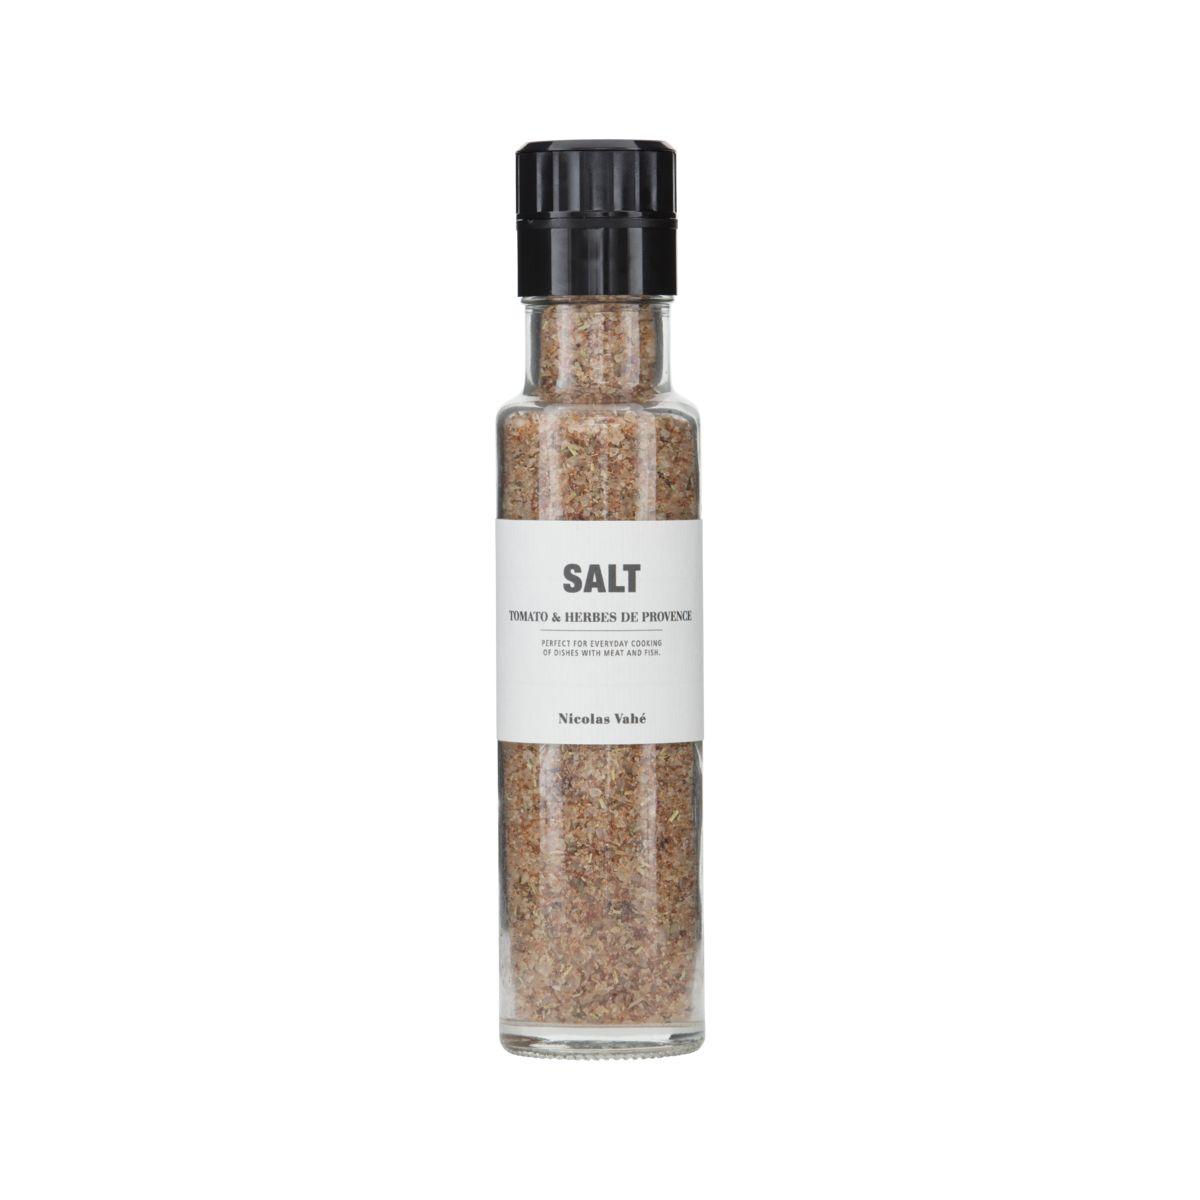 Salz Tomate & Kräuter der Provence